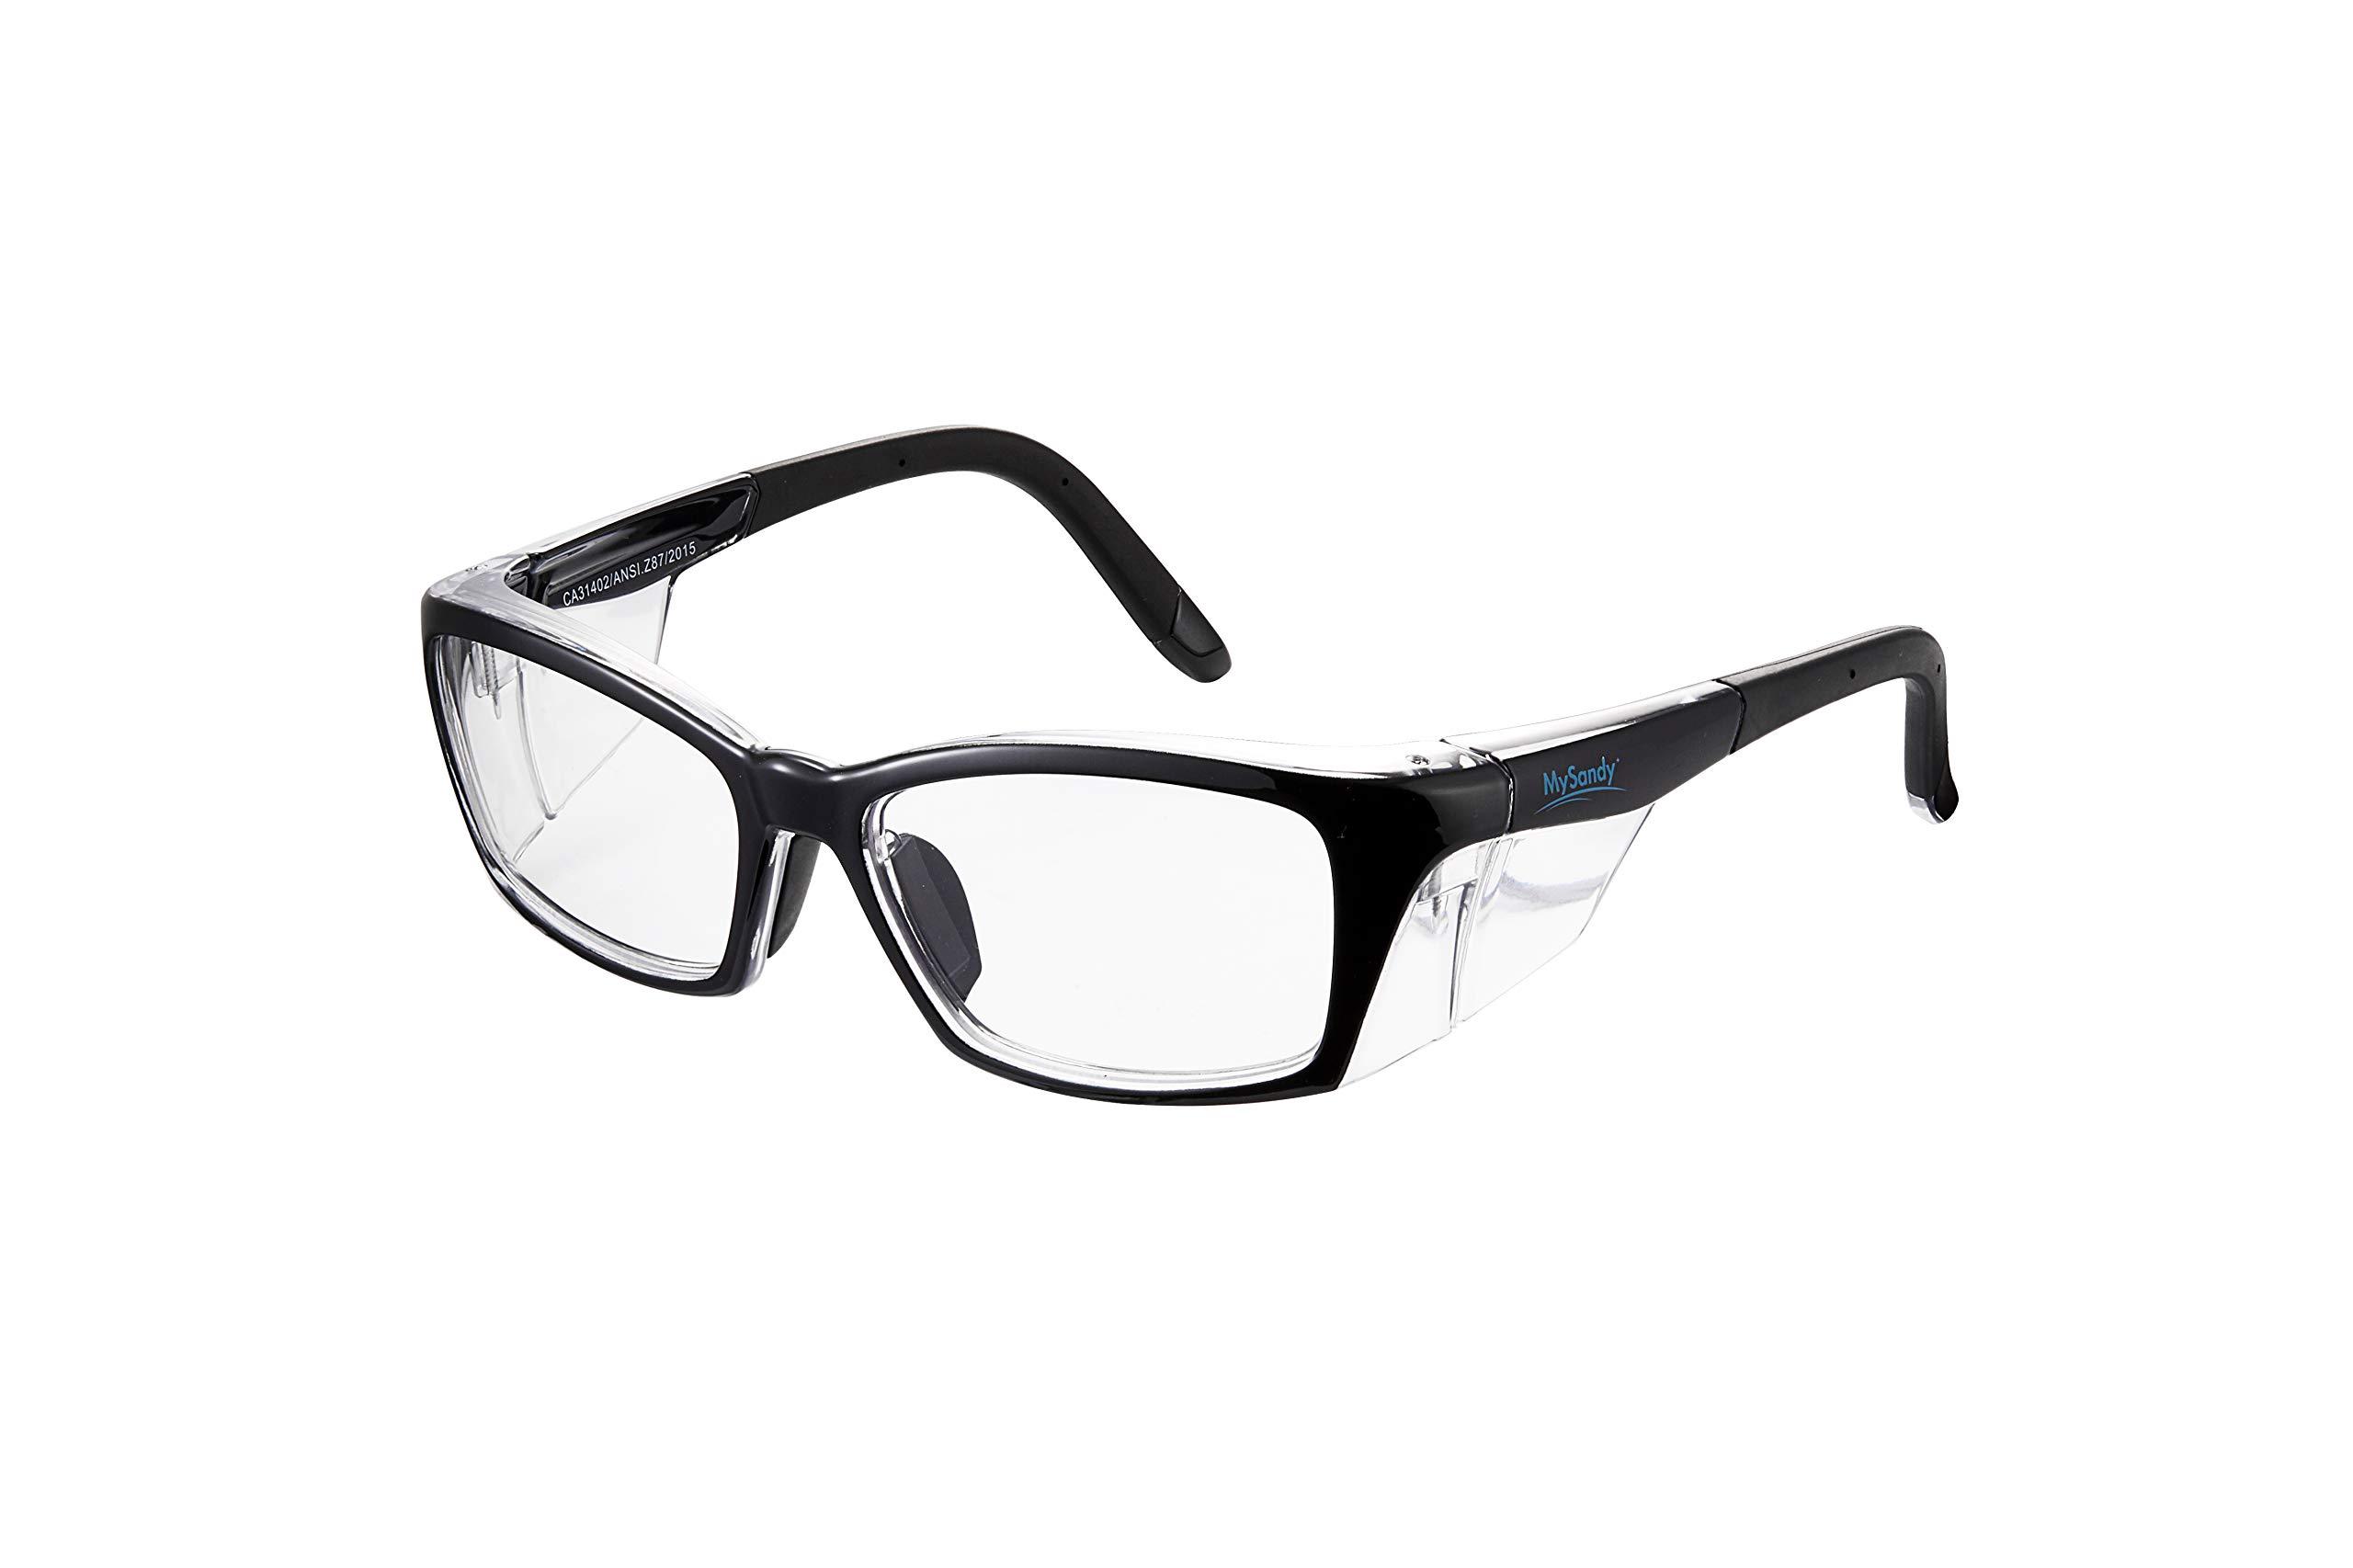 Safety Glasses Reduce Eye Strain & Fatigue, UV Protection, Anti Fog Coating Clear Blue Light Blocking Lens (OP40-Black) by MYSANDY